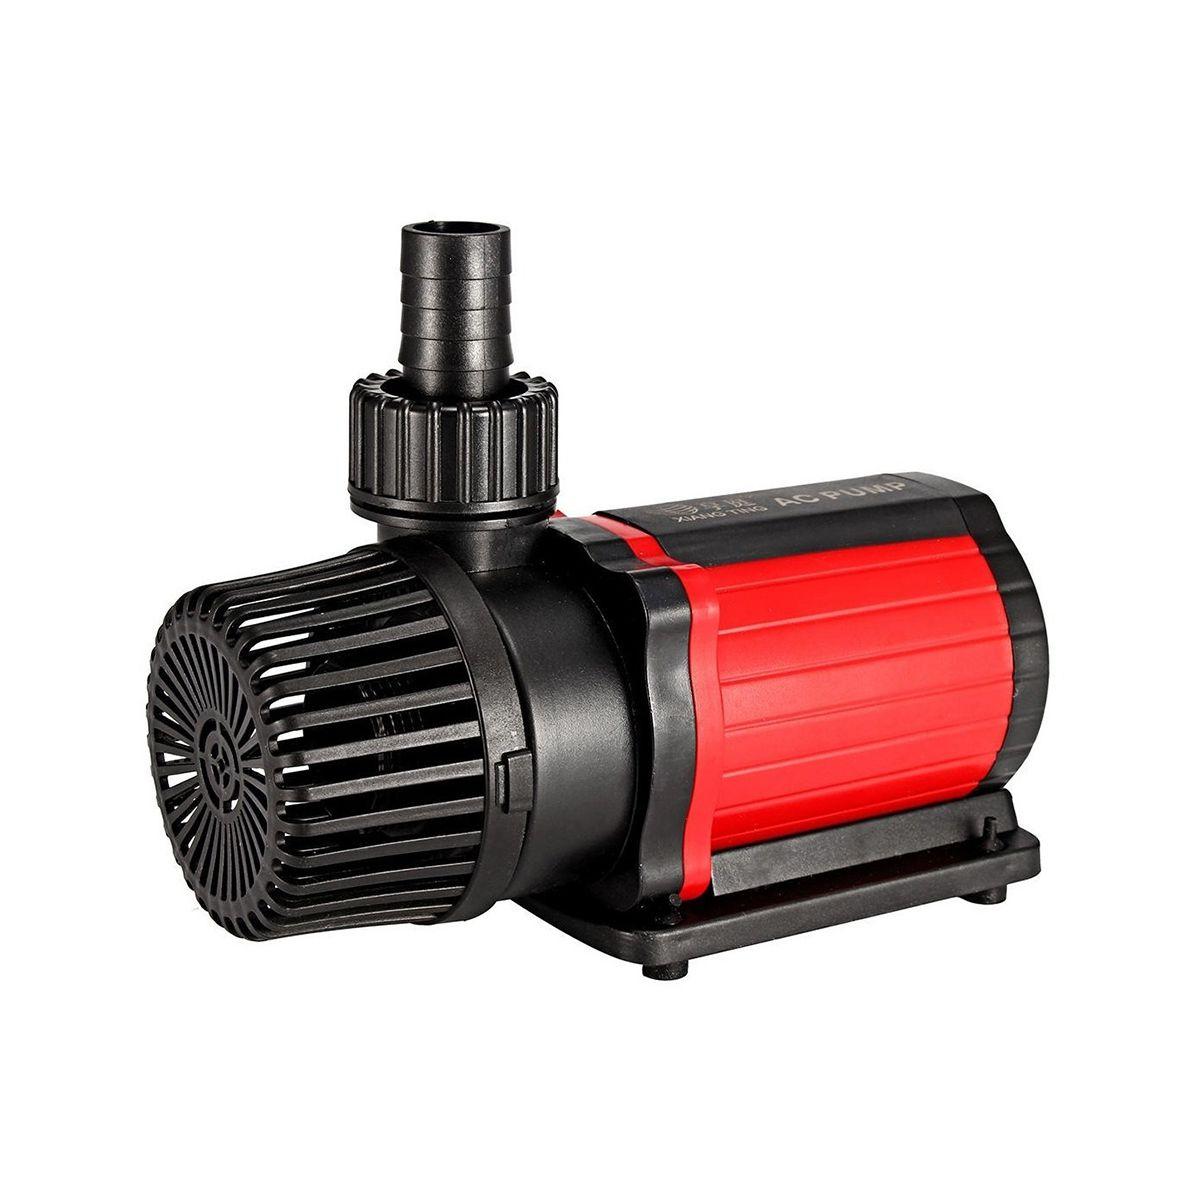 Bomba Ocean Tech AC-3000 Eletrônica Econômica 3000l/h